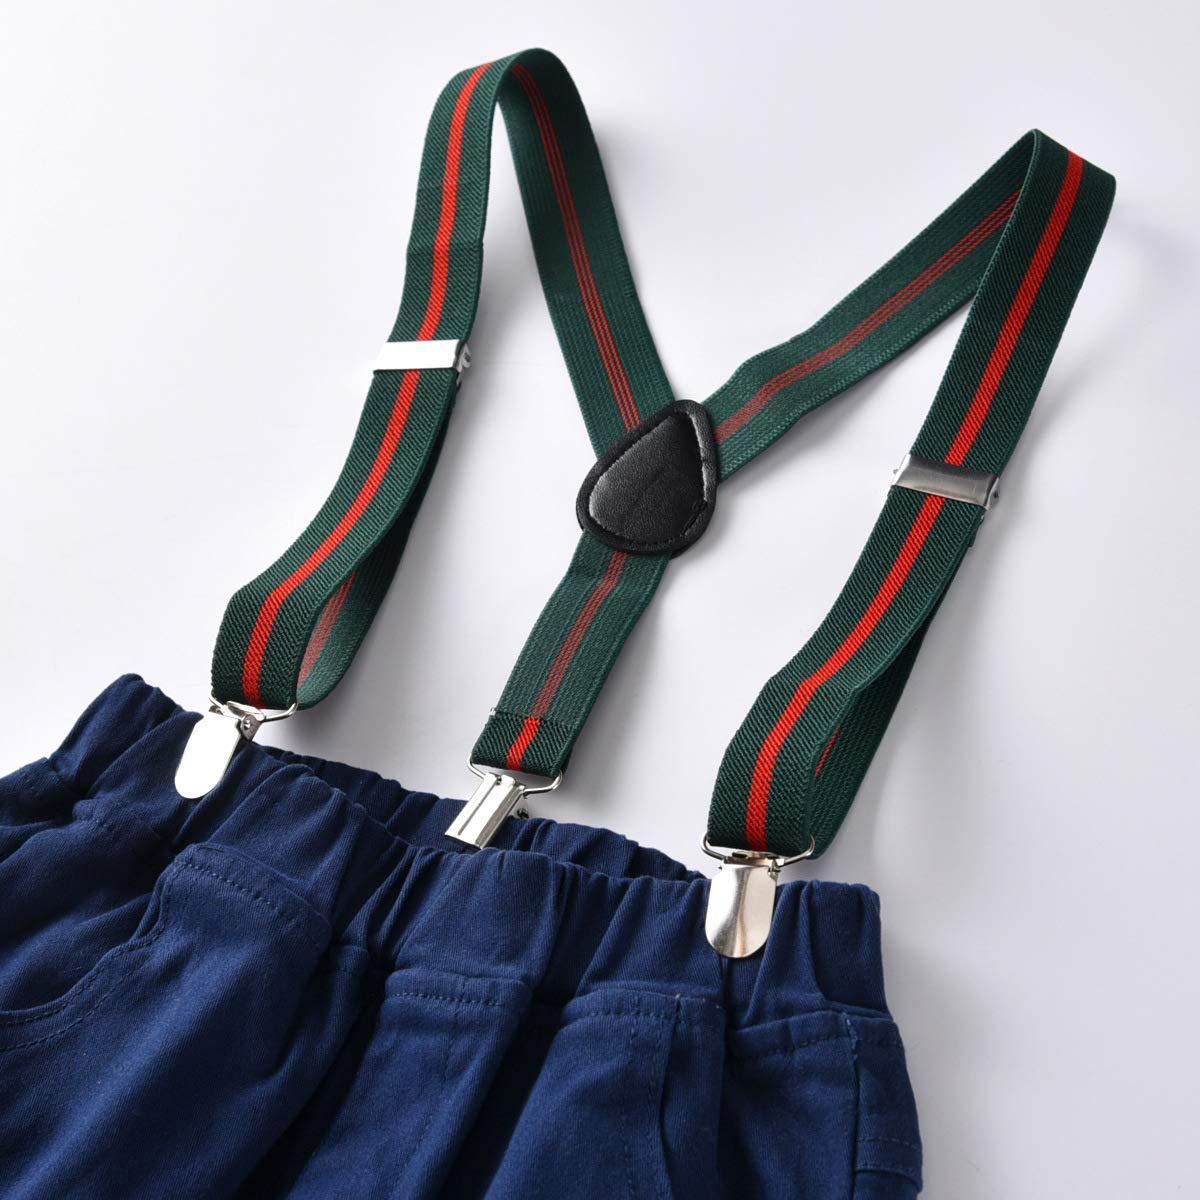 Toddler Baby Boys Gentleman Bowtie Color Block Shirt Suspenders Outfit Suit Set